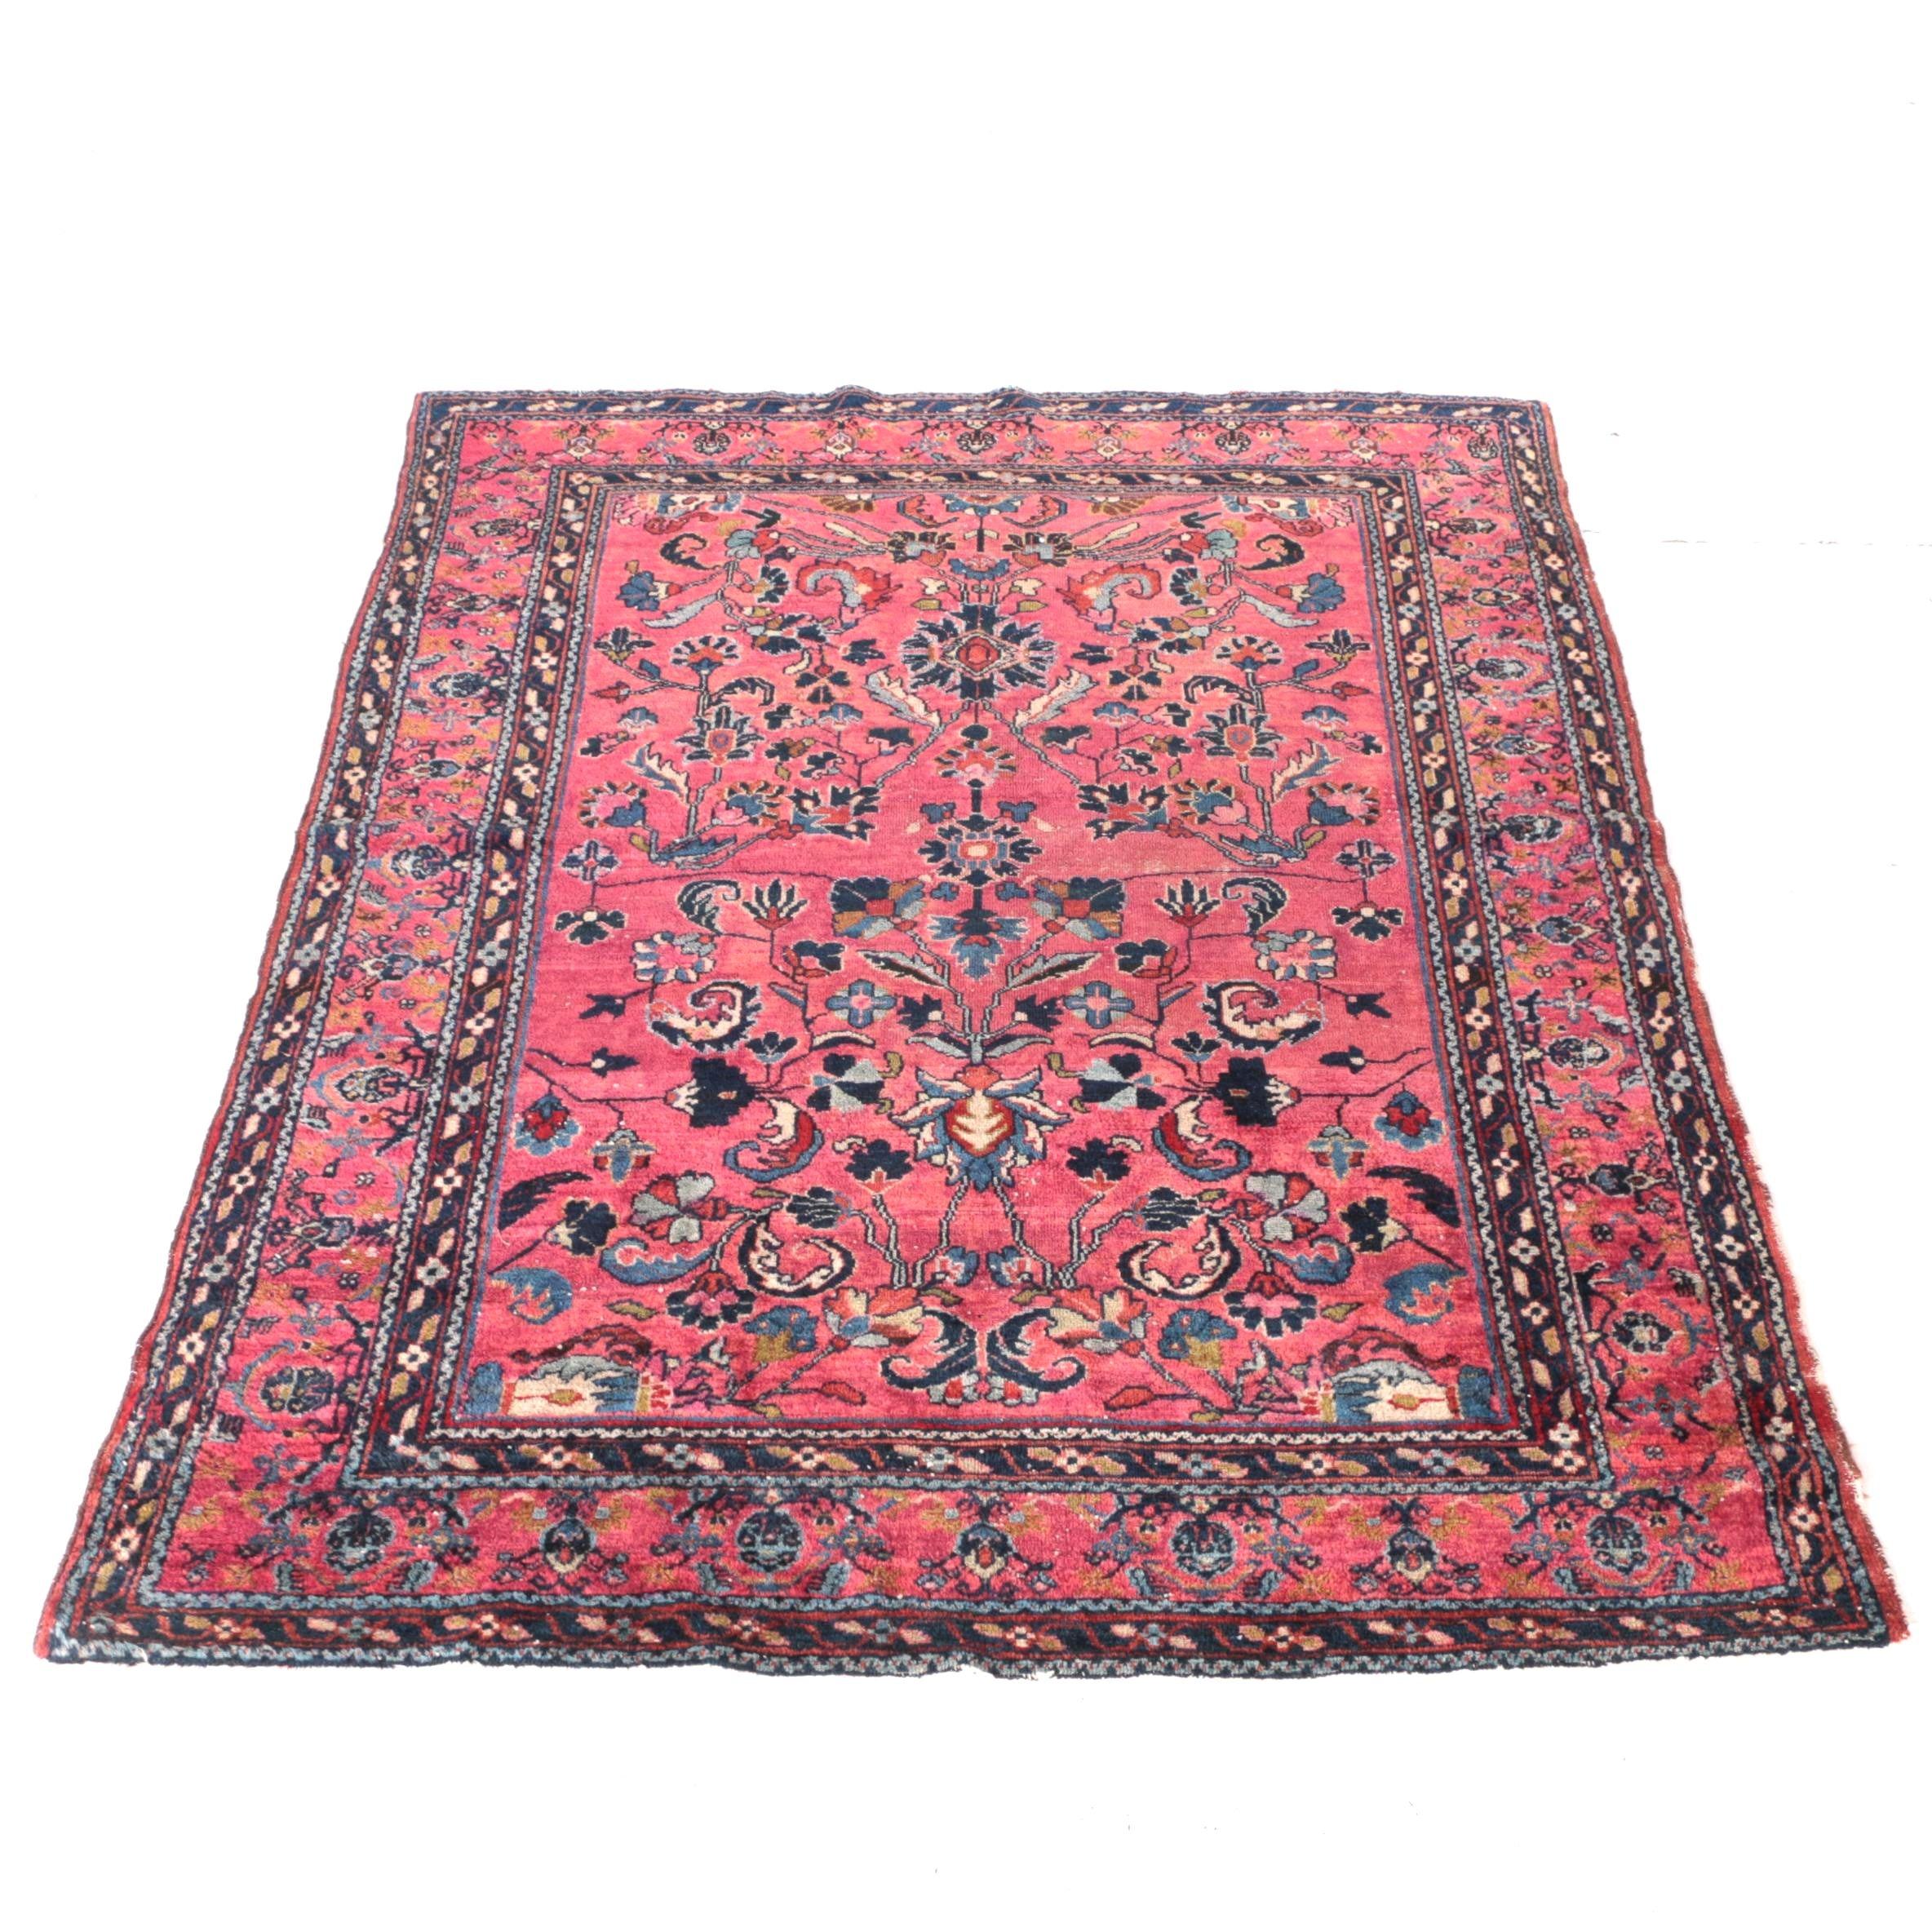 Semi-Antique Hand-Knotted Persian Arak Area Rug